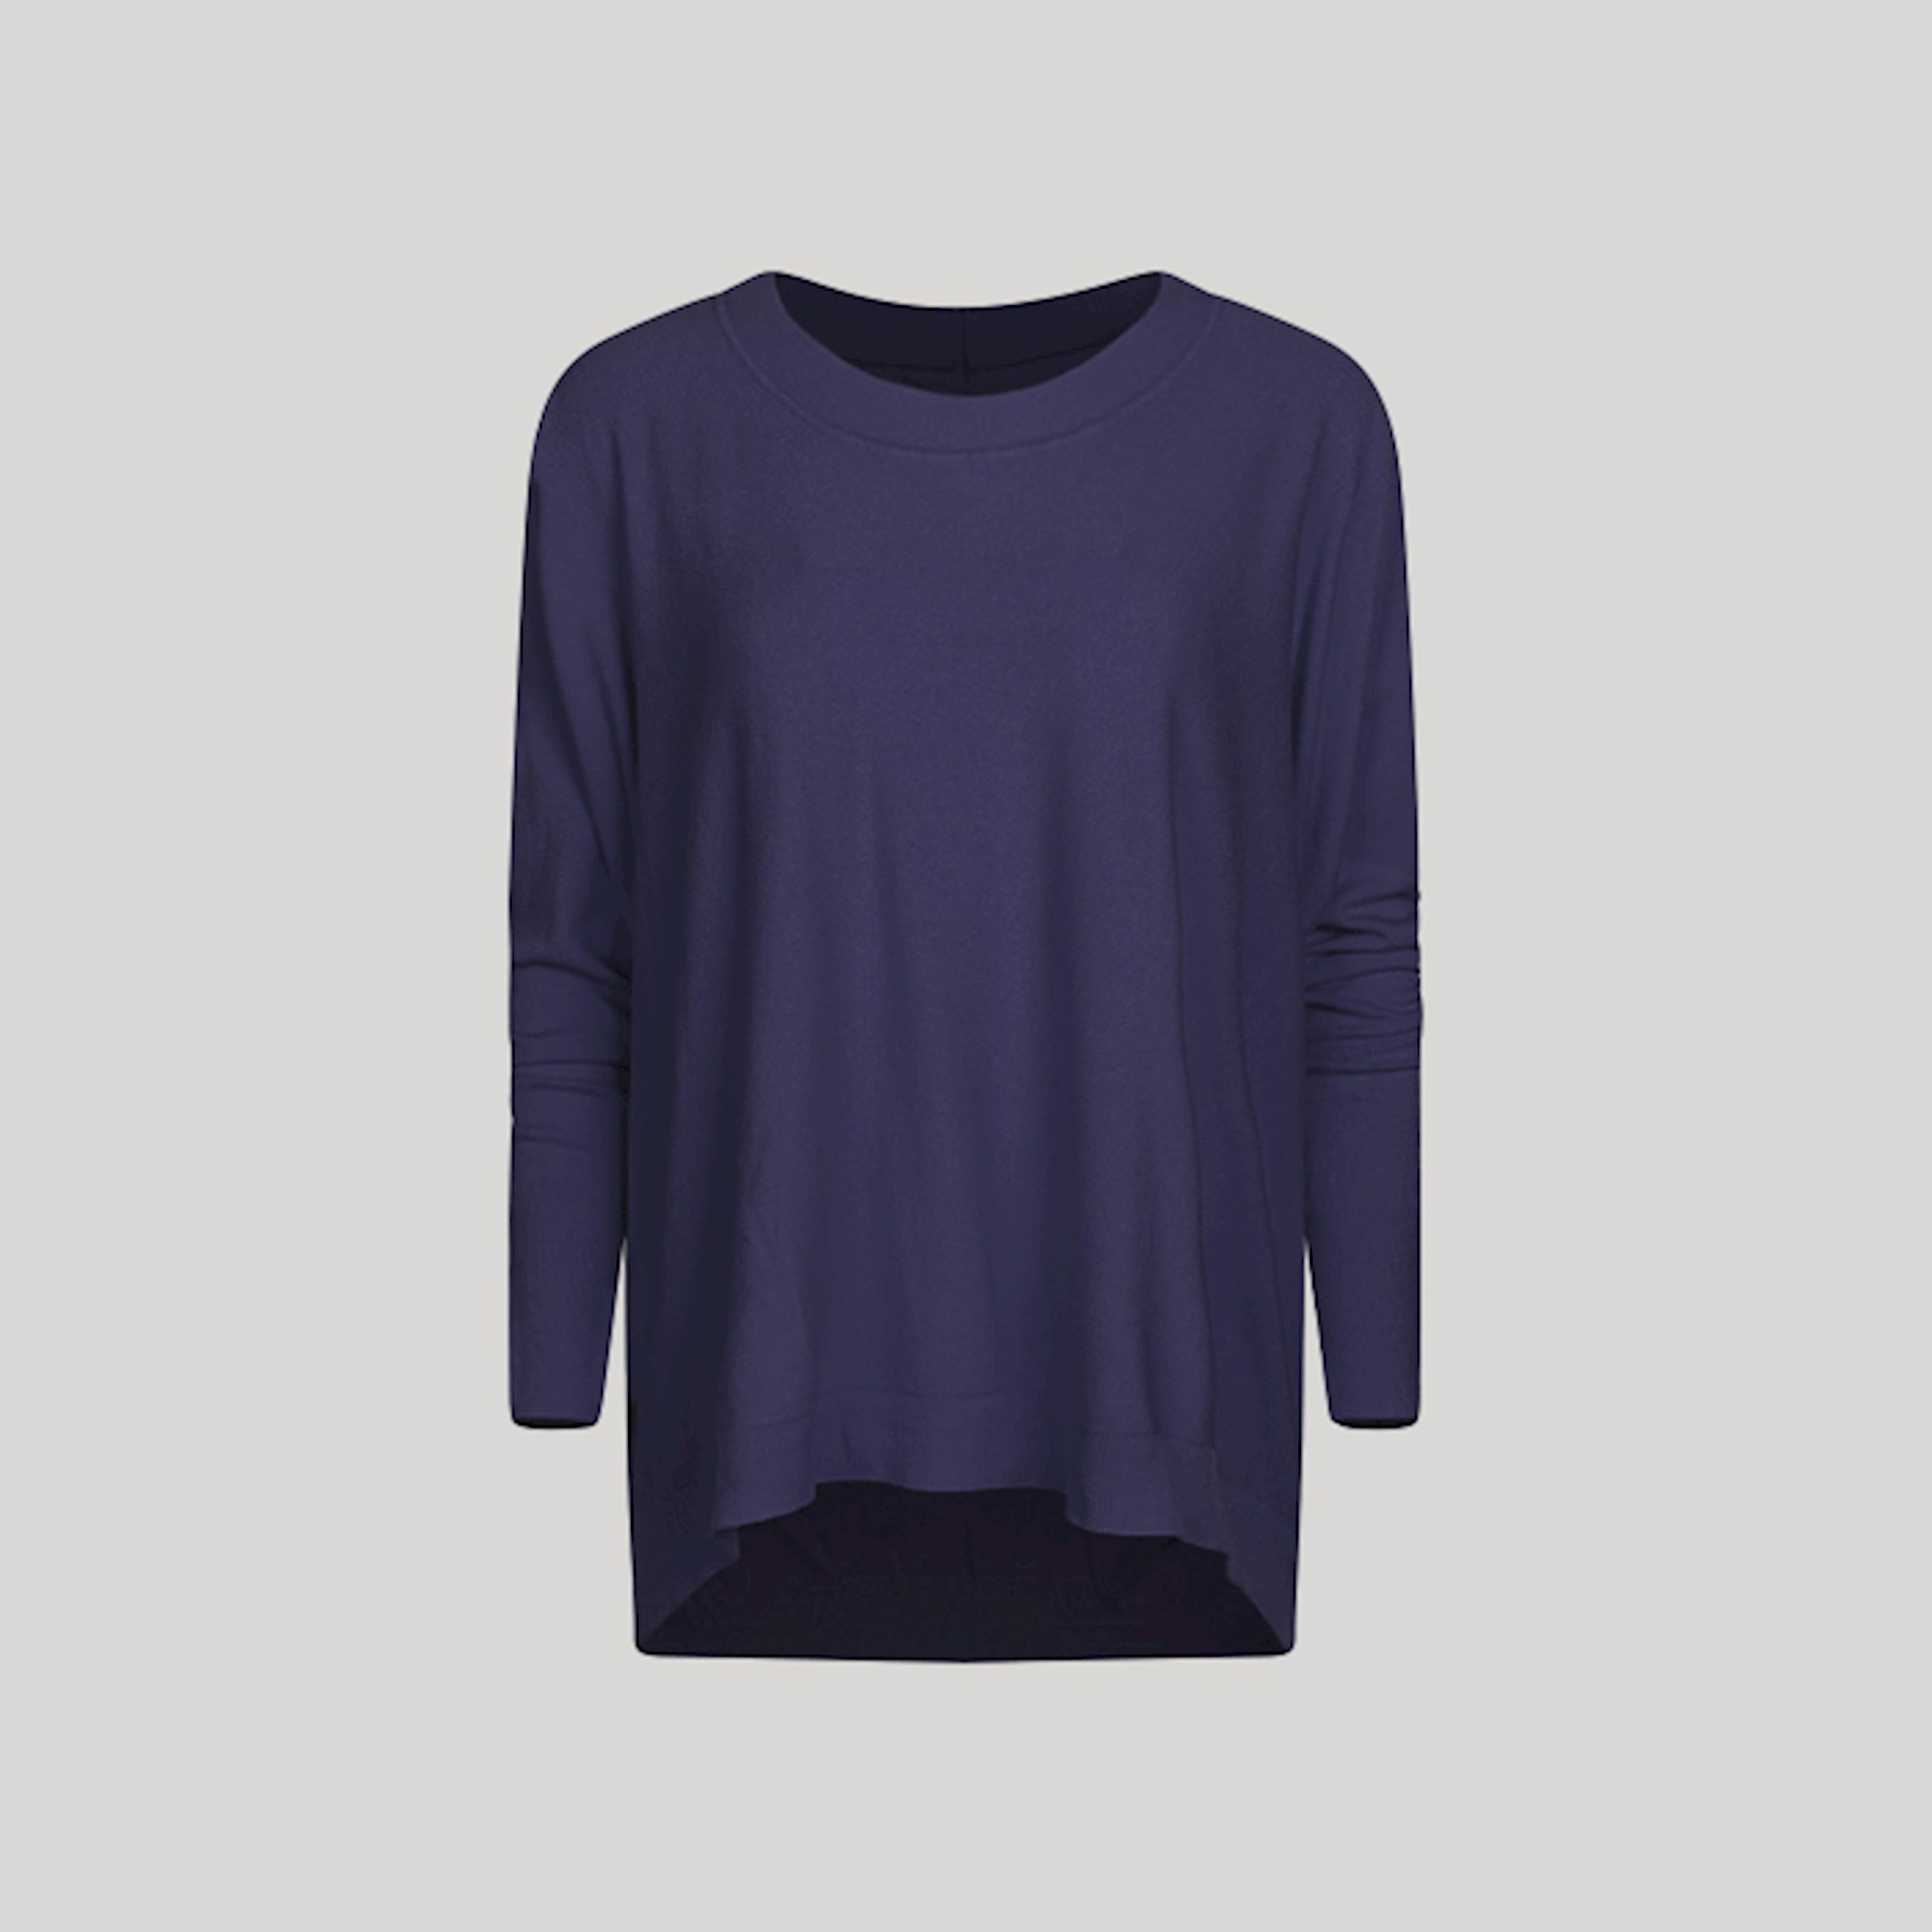 Summum oversized sweater 7S5599-7830-1